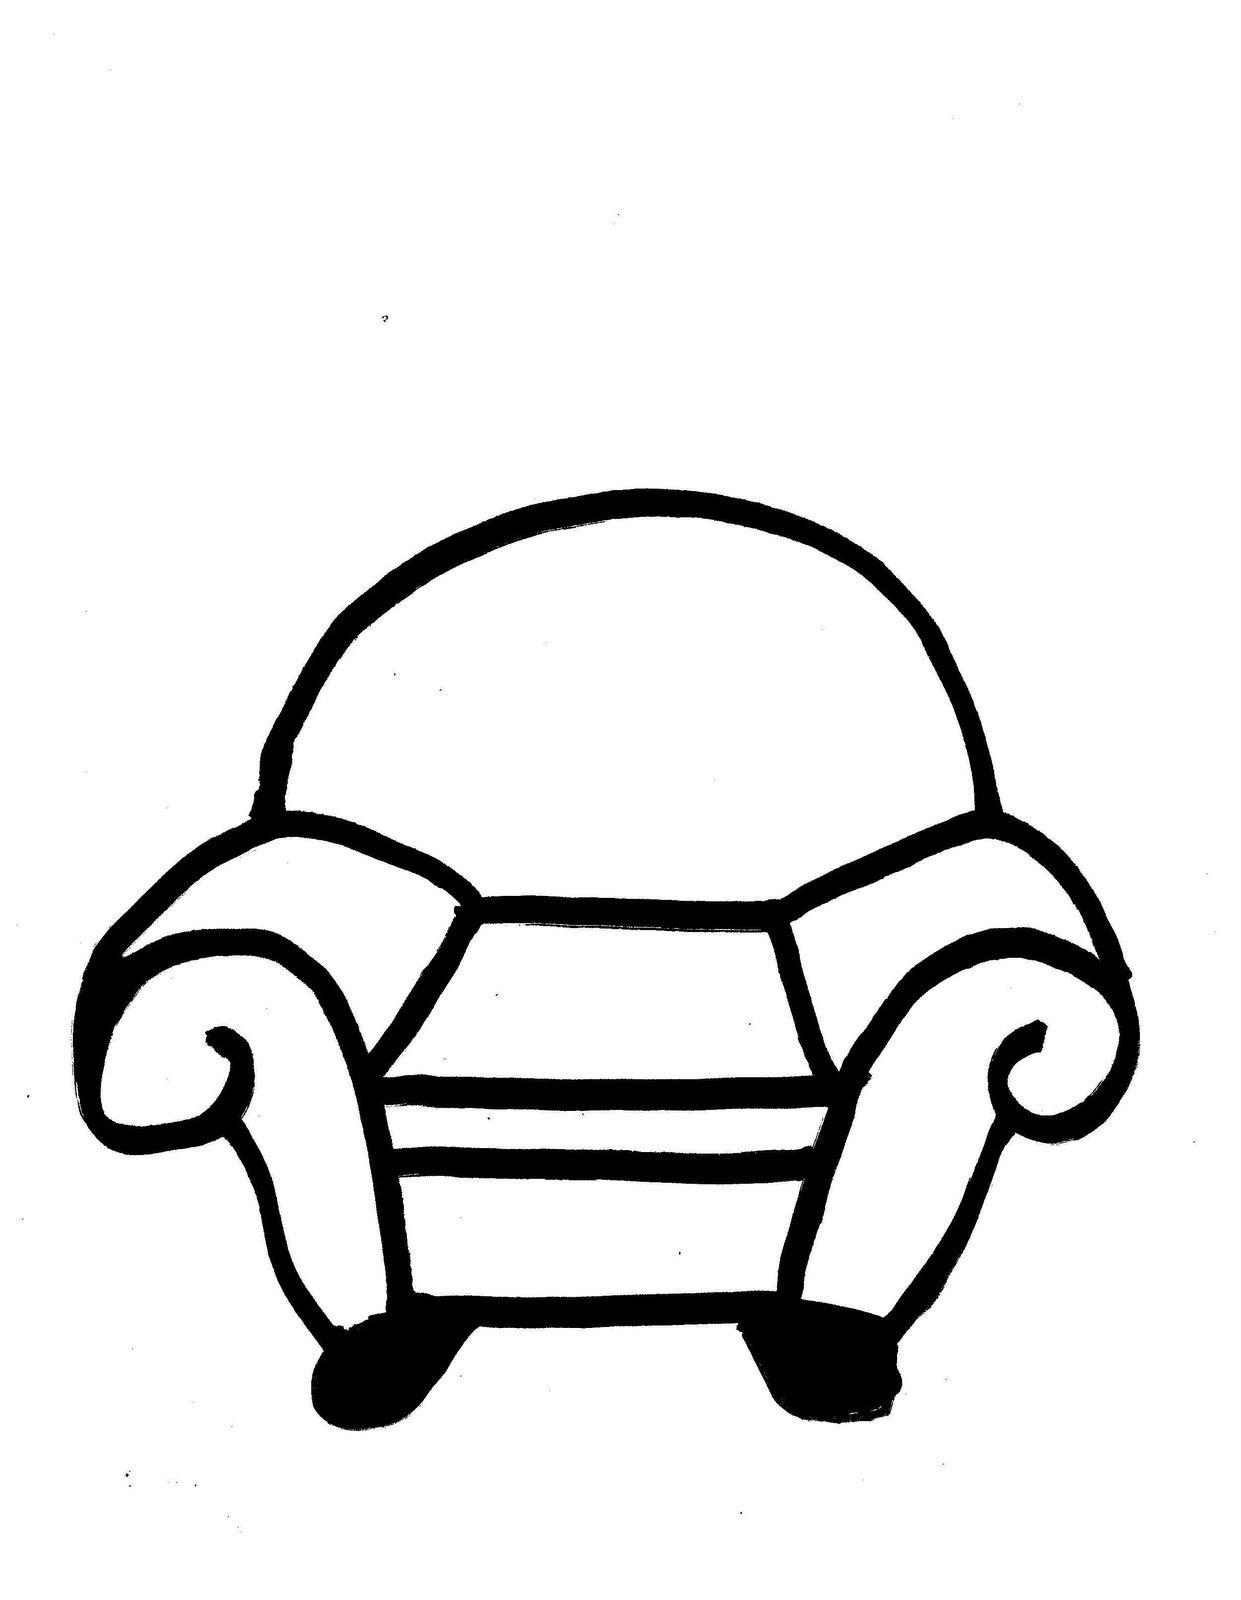 Thinking Chair Bmp 1 241 1 600 Pixels Blues Clues Blue S Clues